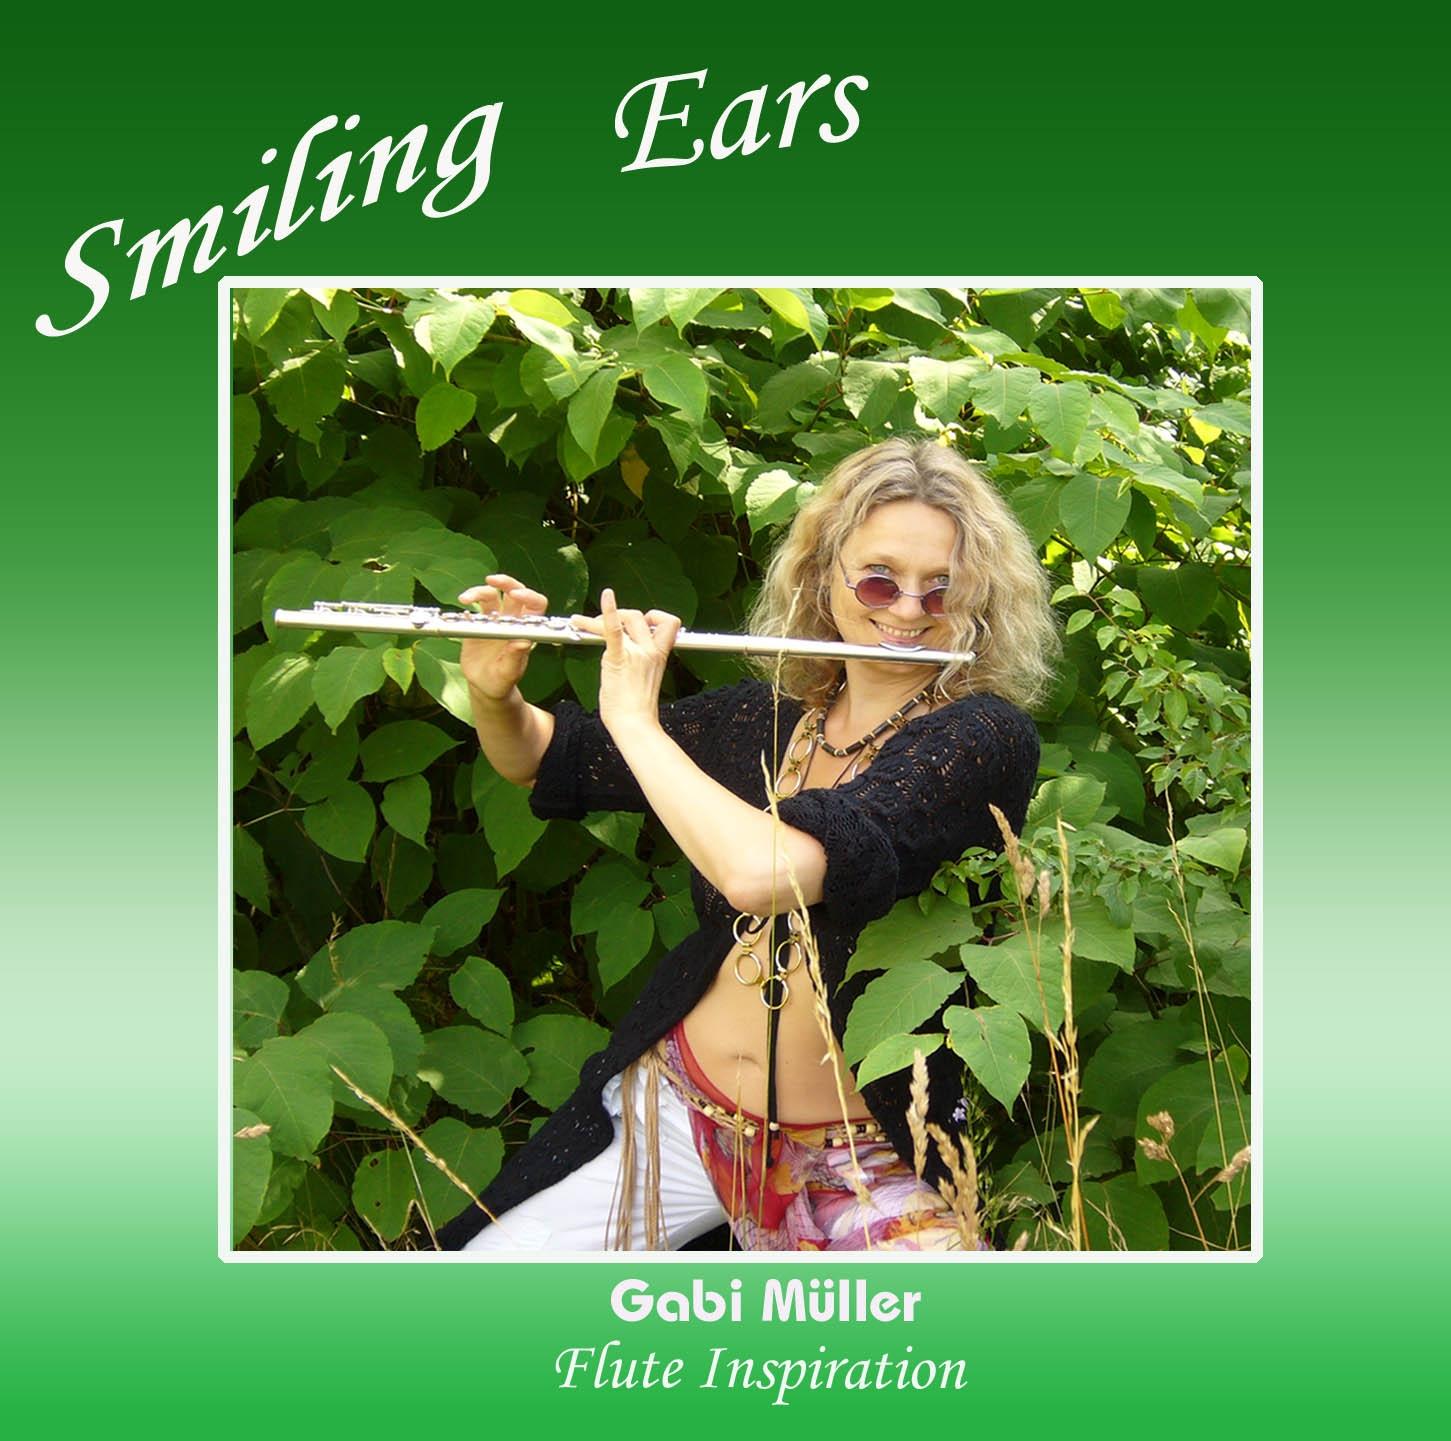 cd smiling ears pflanzen versand f r die besten winterharten balkonpflanzen k belpflanzen. Black Bedroom Furniture Sets. Home Design Ideas